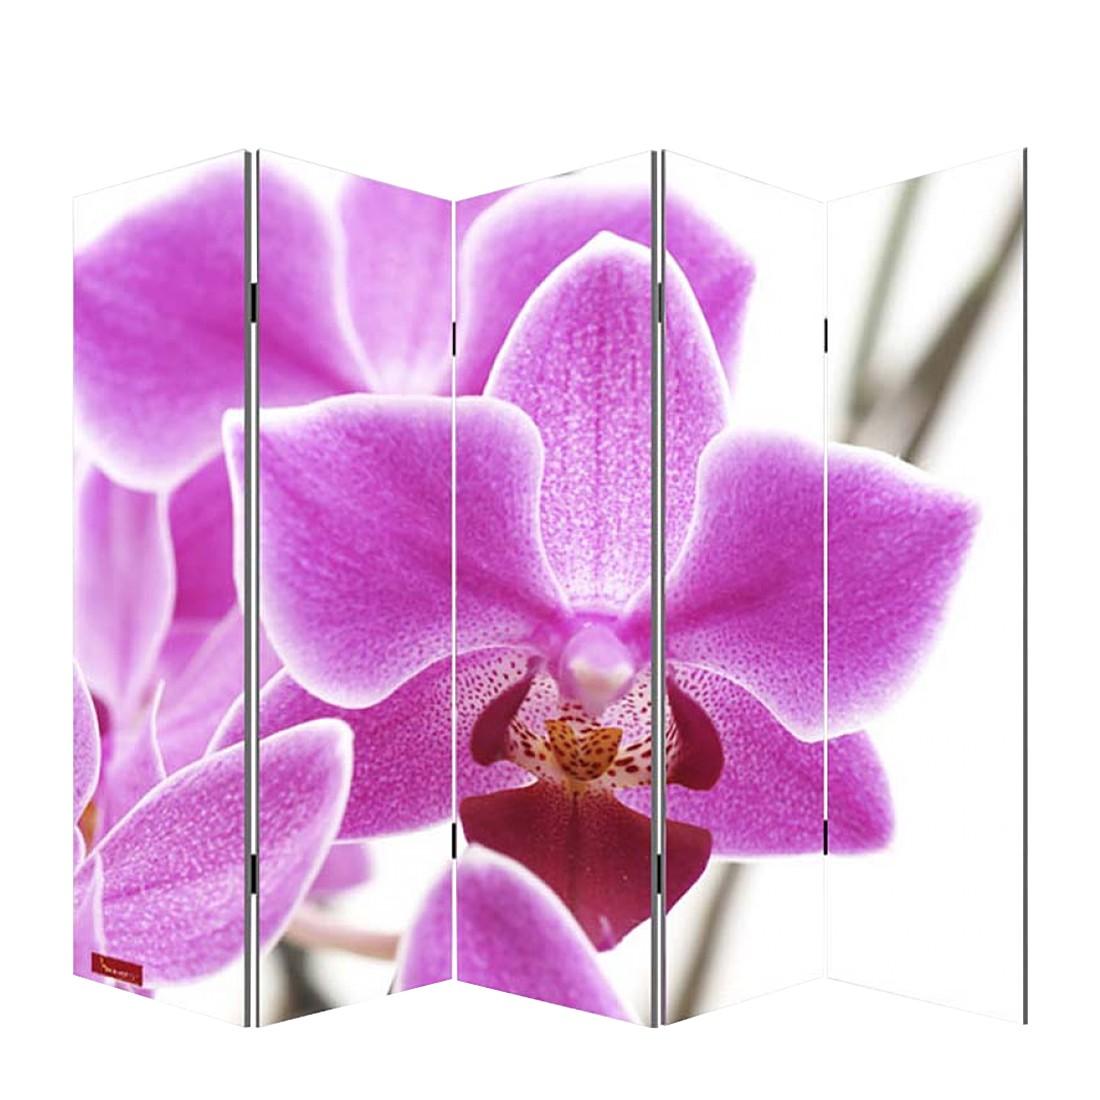 Paravent Somme aus 5 Panels – 180 x 200 cm – Orchidee, Mendler günstig online kaufen